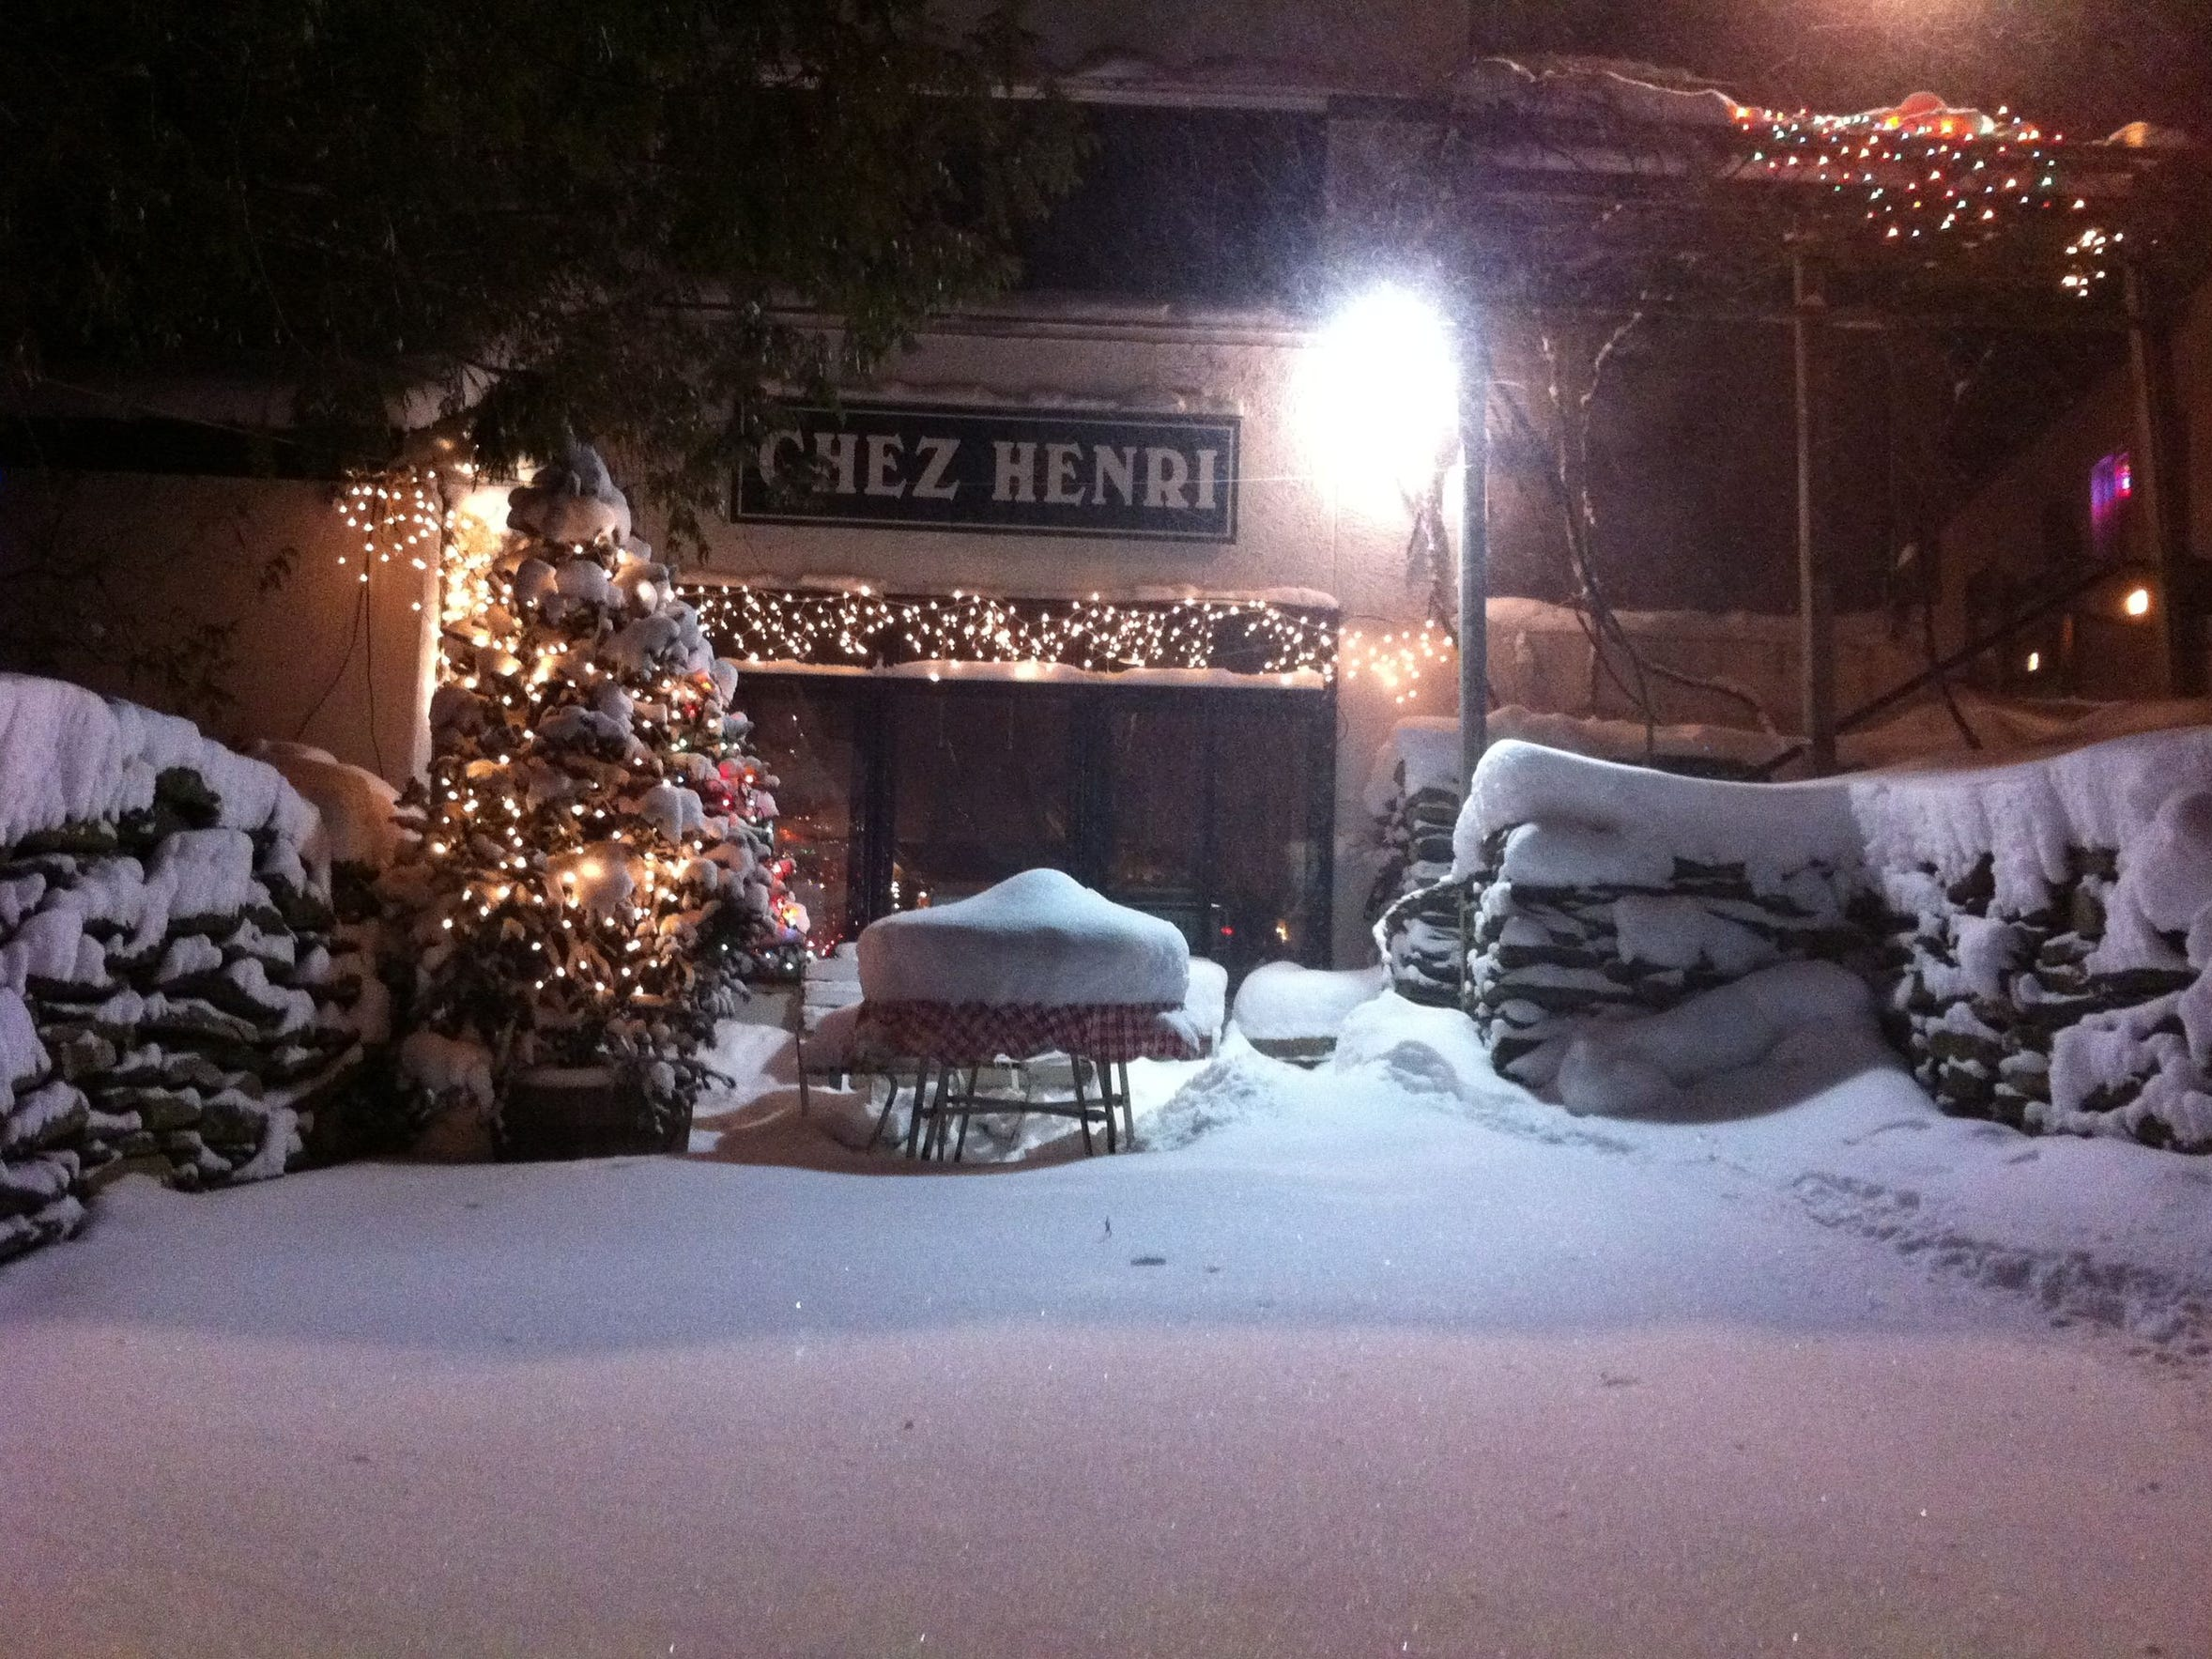 Chez Henri snowy.jpg